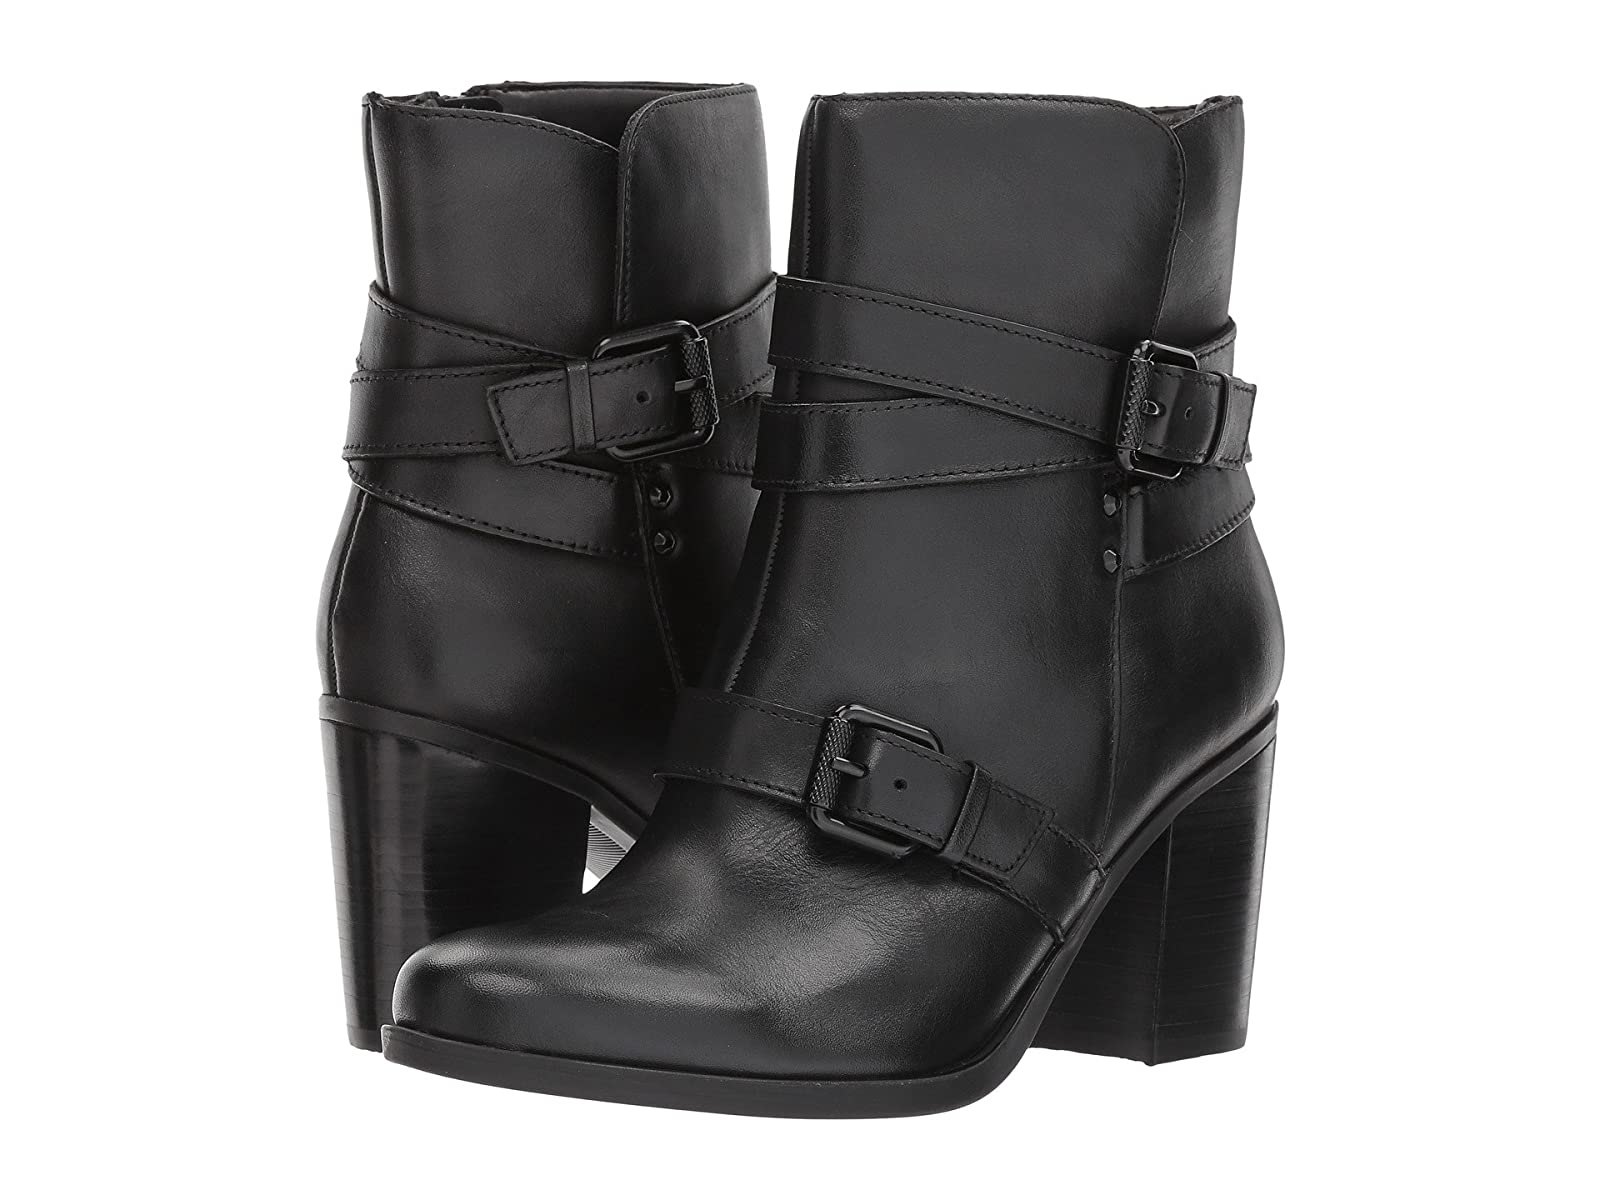 Naturalizer KarlieCheap and distinctive eye-catching shoes